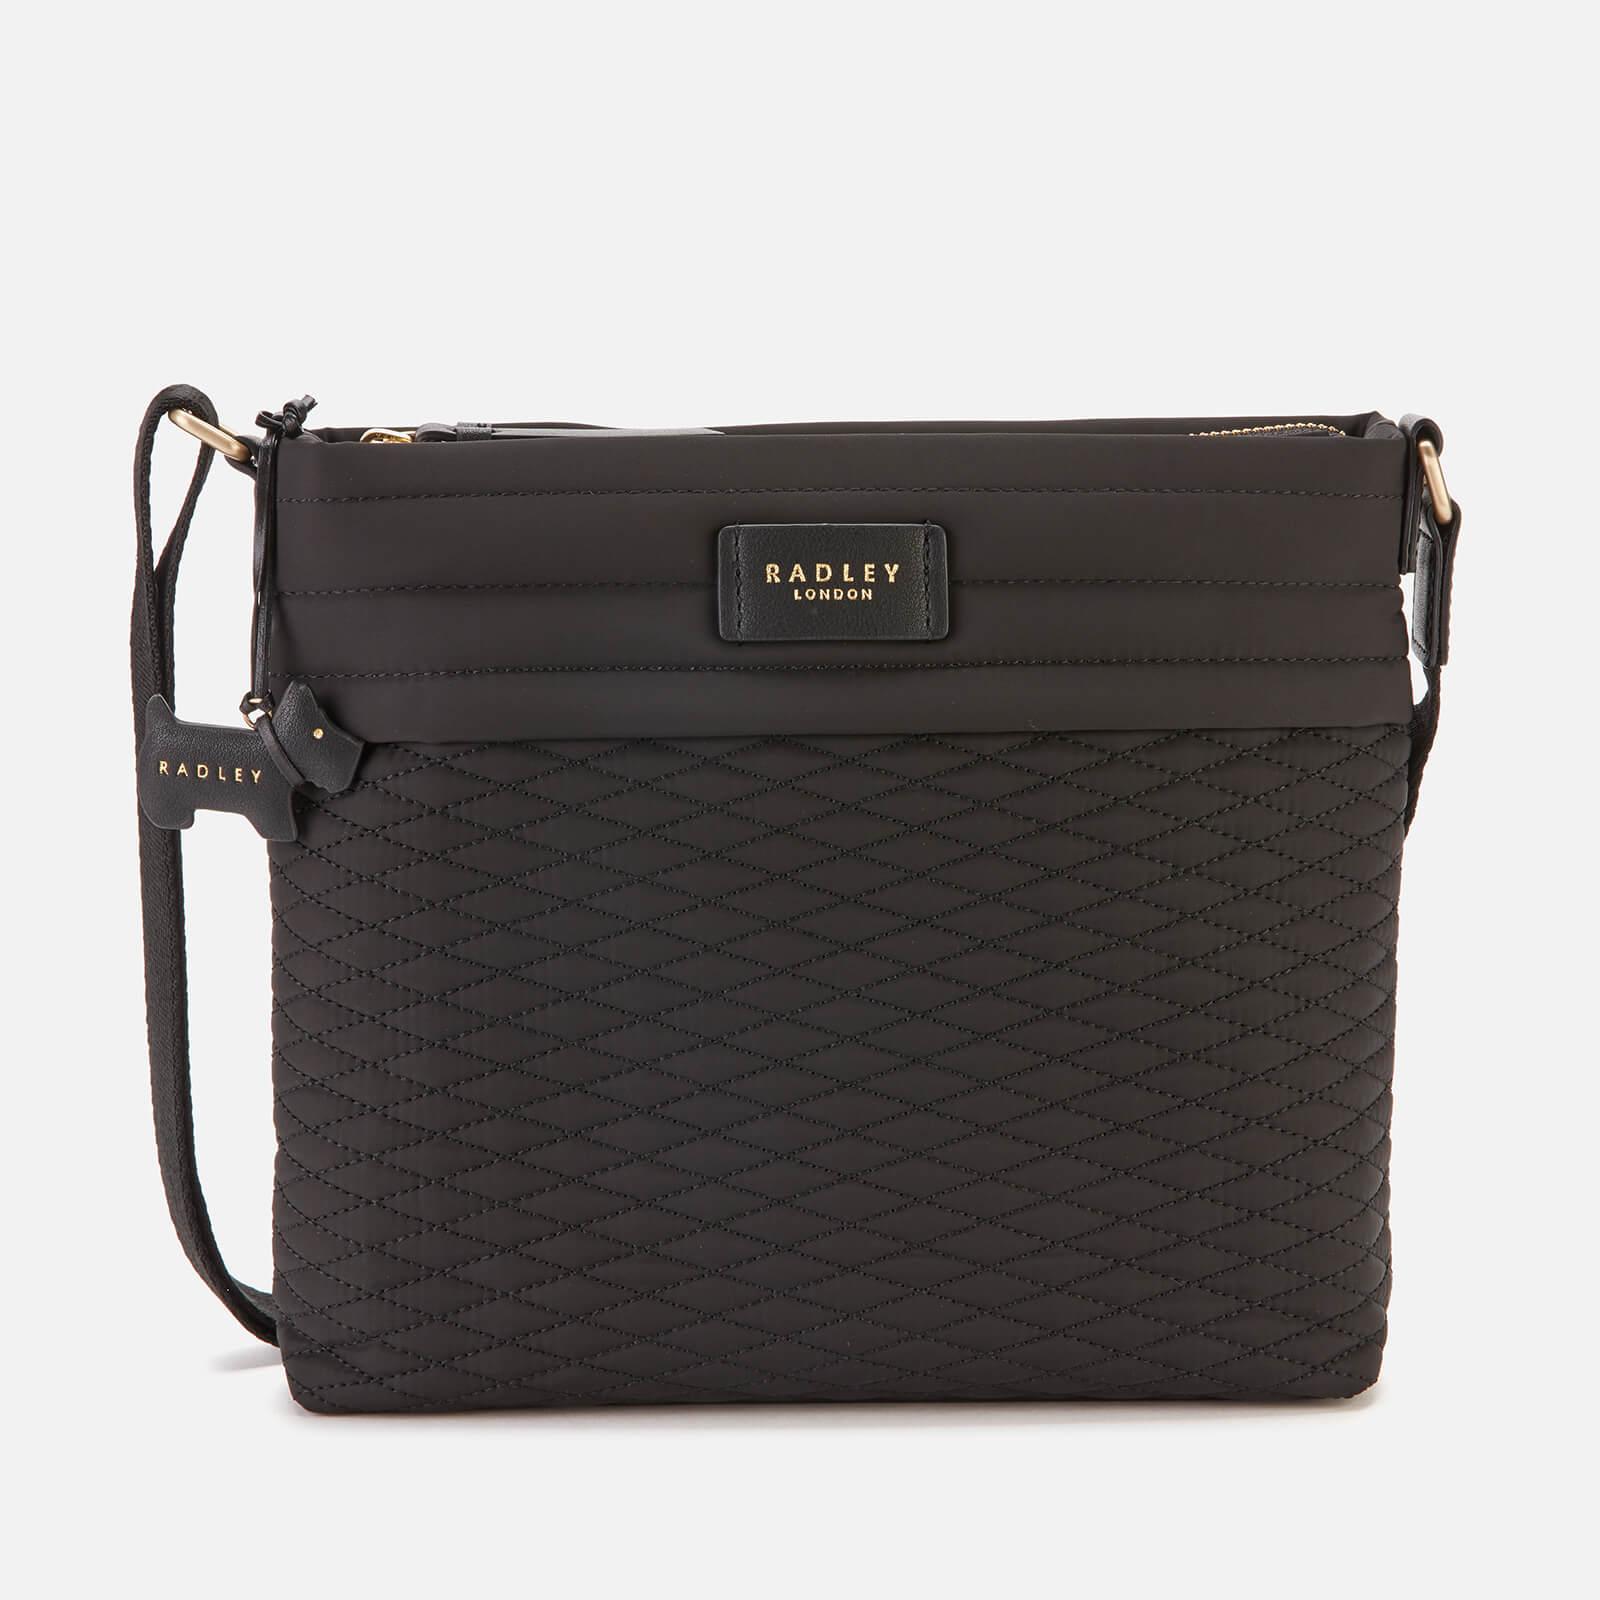 Radley Women's Penton Mews Medium Cross Body Bag Ziptop - Black